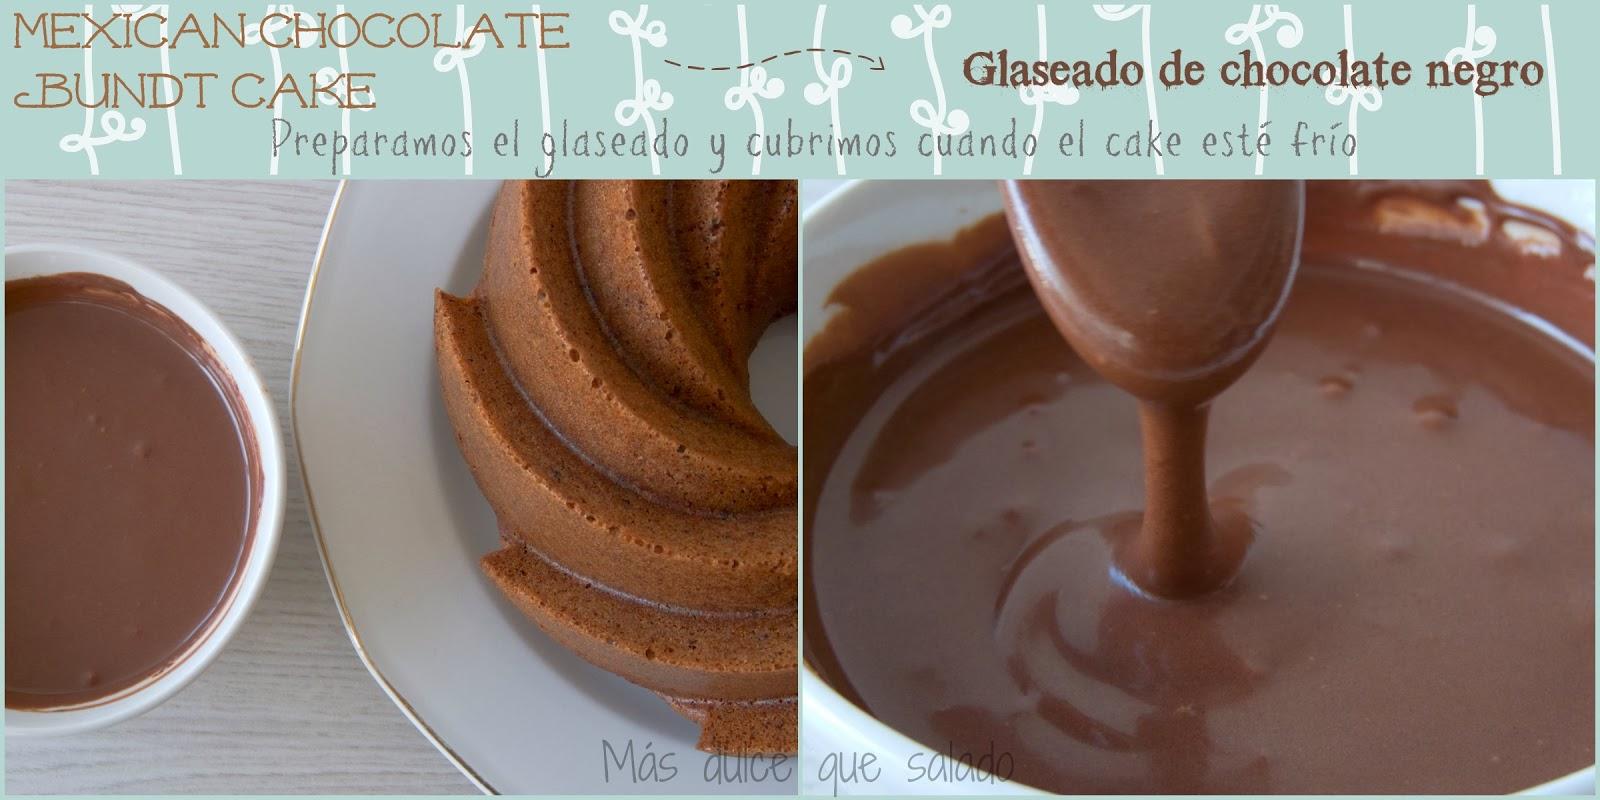 M s dulce que salado mexican chocolate bundt cake - Robot de cocina alcampo ...